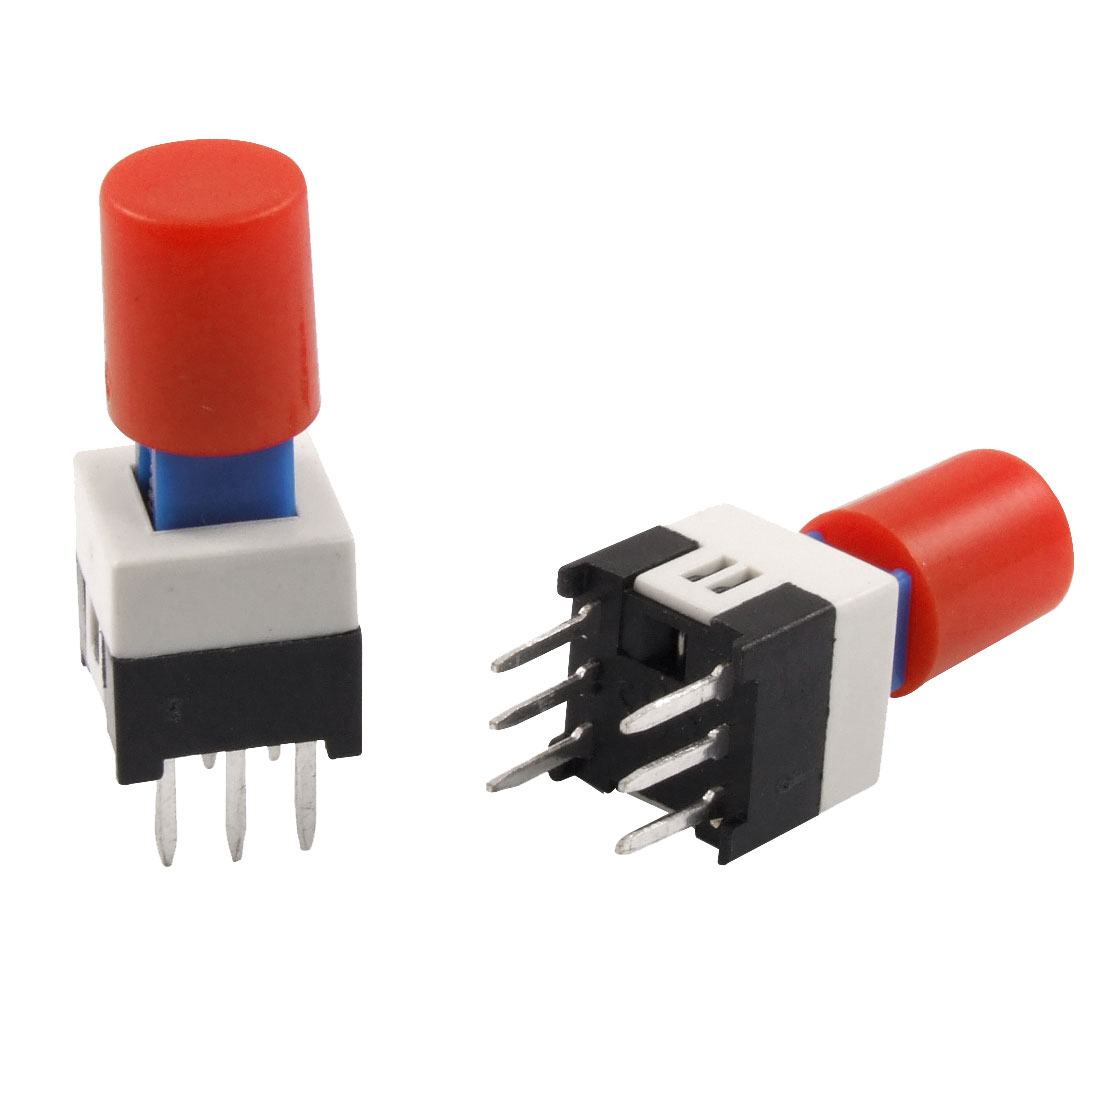 10 Pcs Red Cap 7 x 7mm x 16mm Latching Tactile Tact Push Button Switch 6 Pin DIP